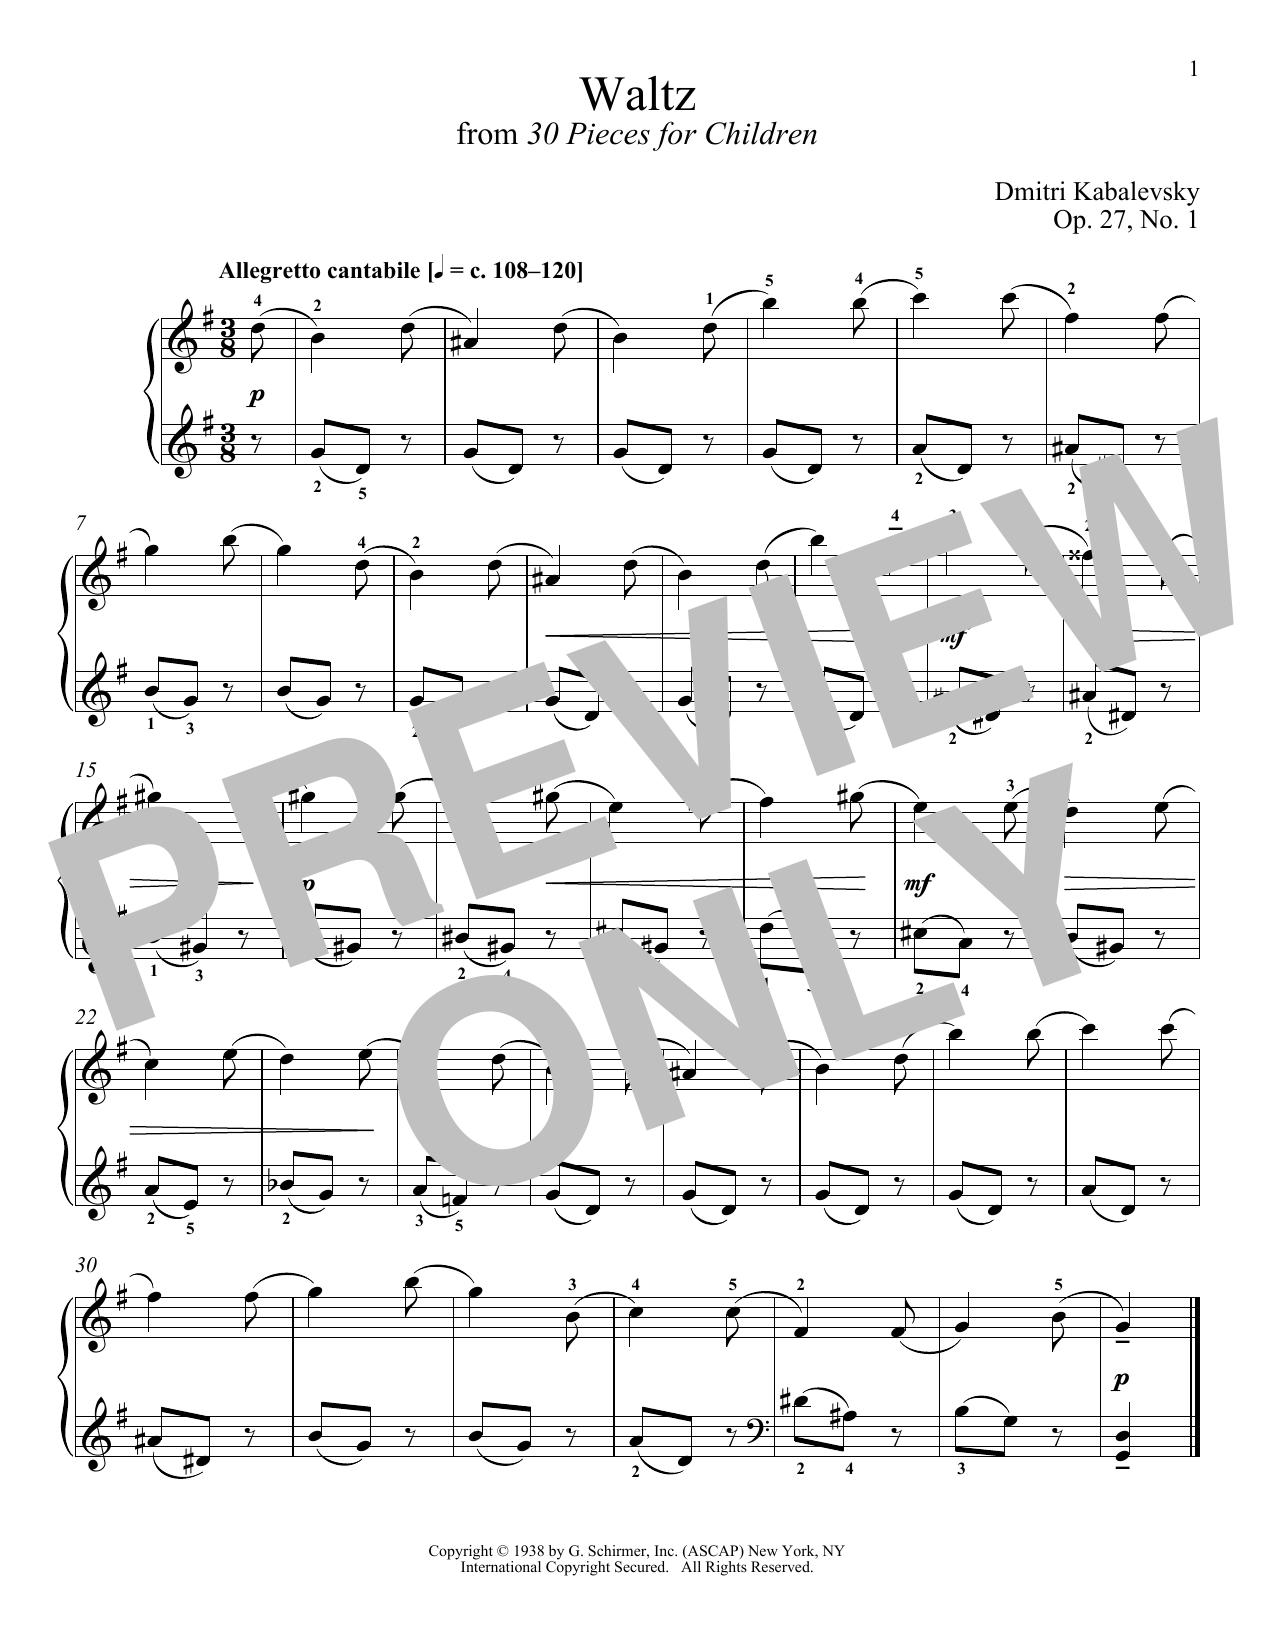 Dmitri Kabalevsky Waltz, Op. 27, No. 1 sheet music notes and chords. Download Printable PDF.